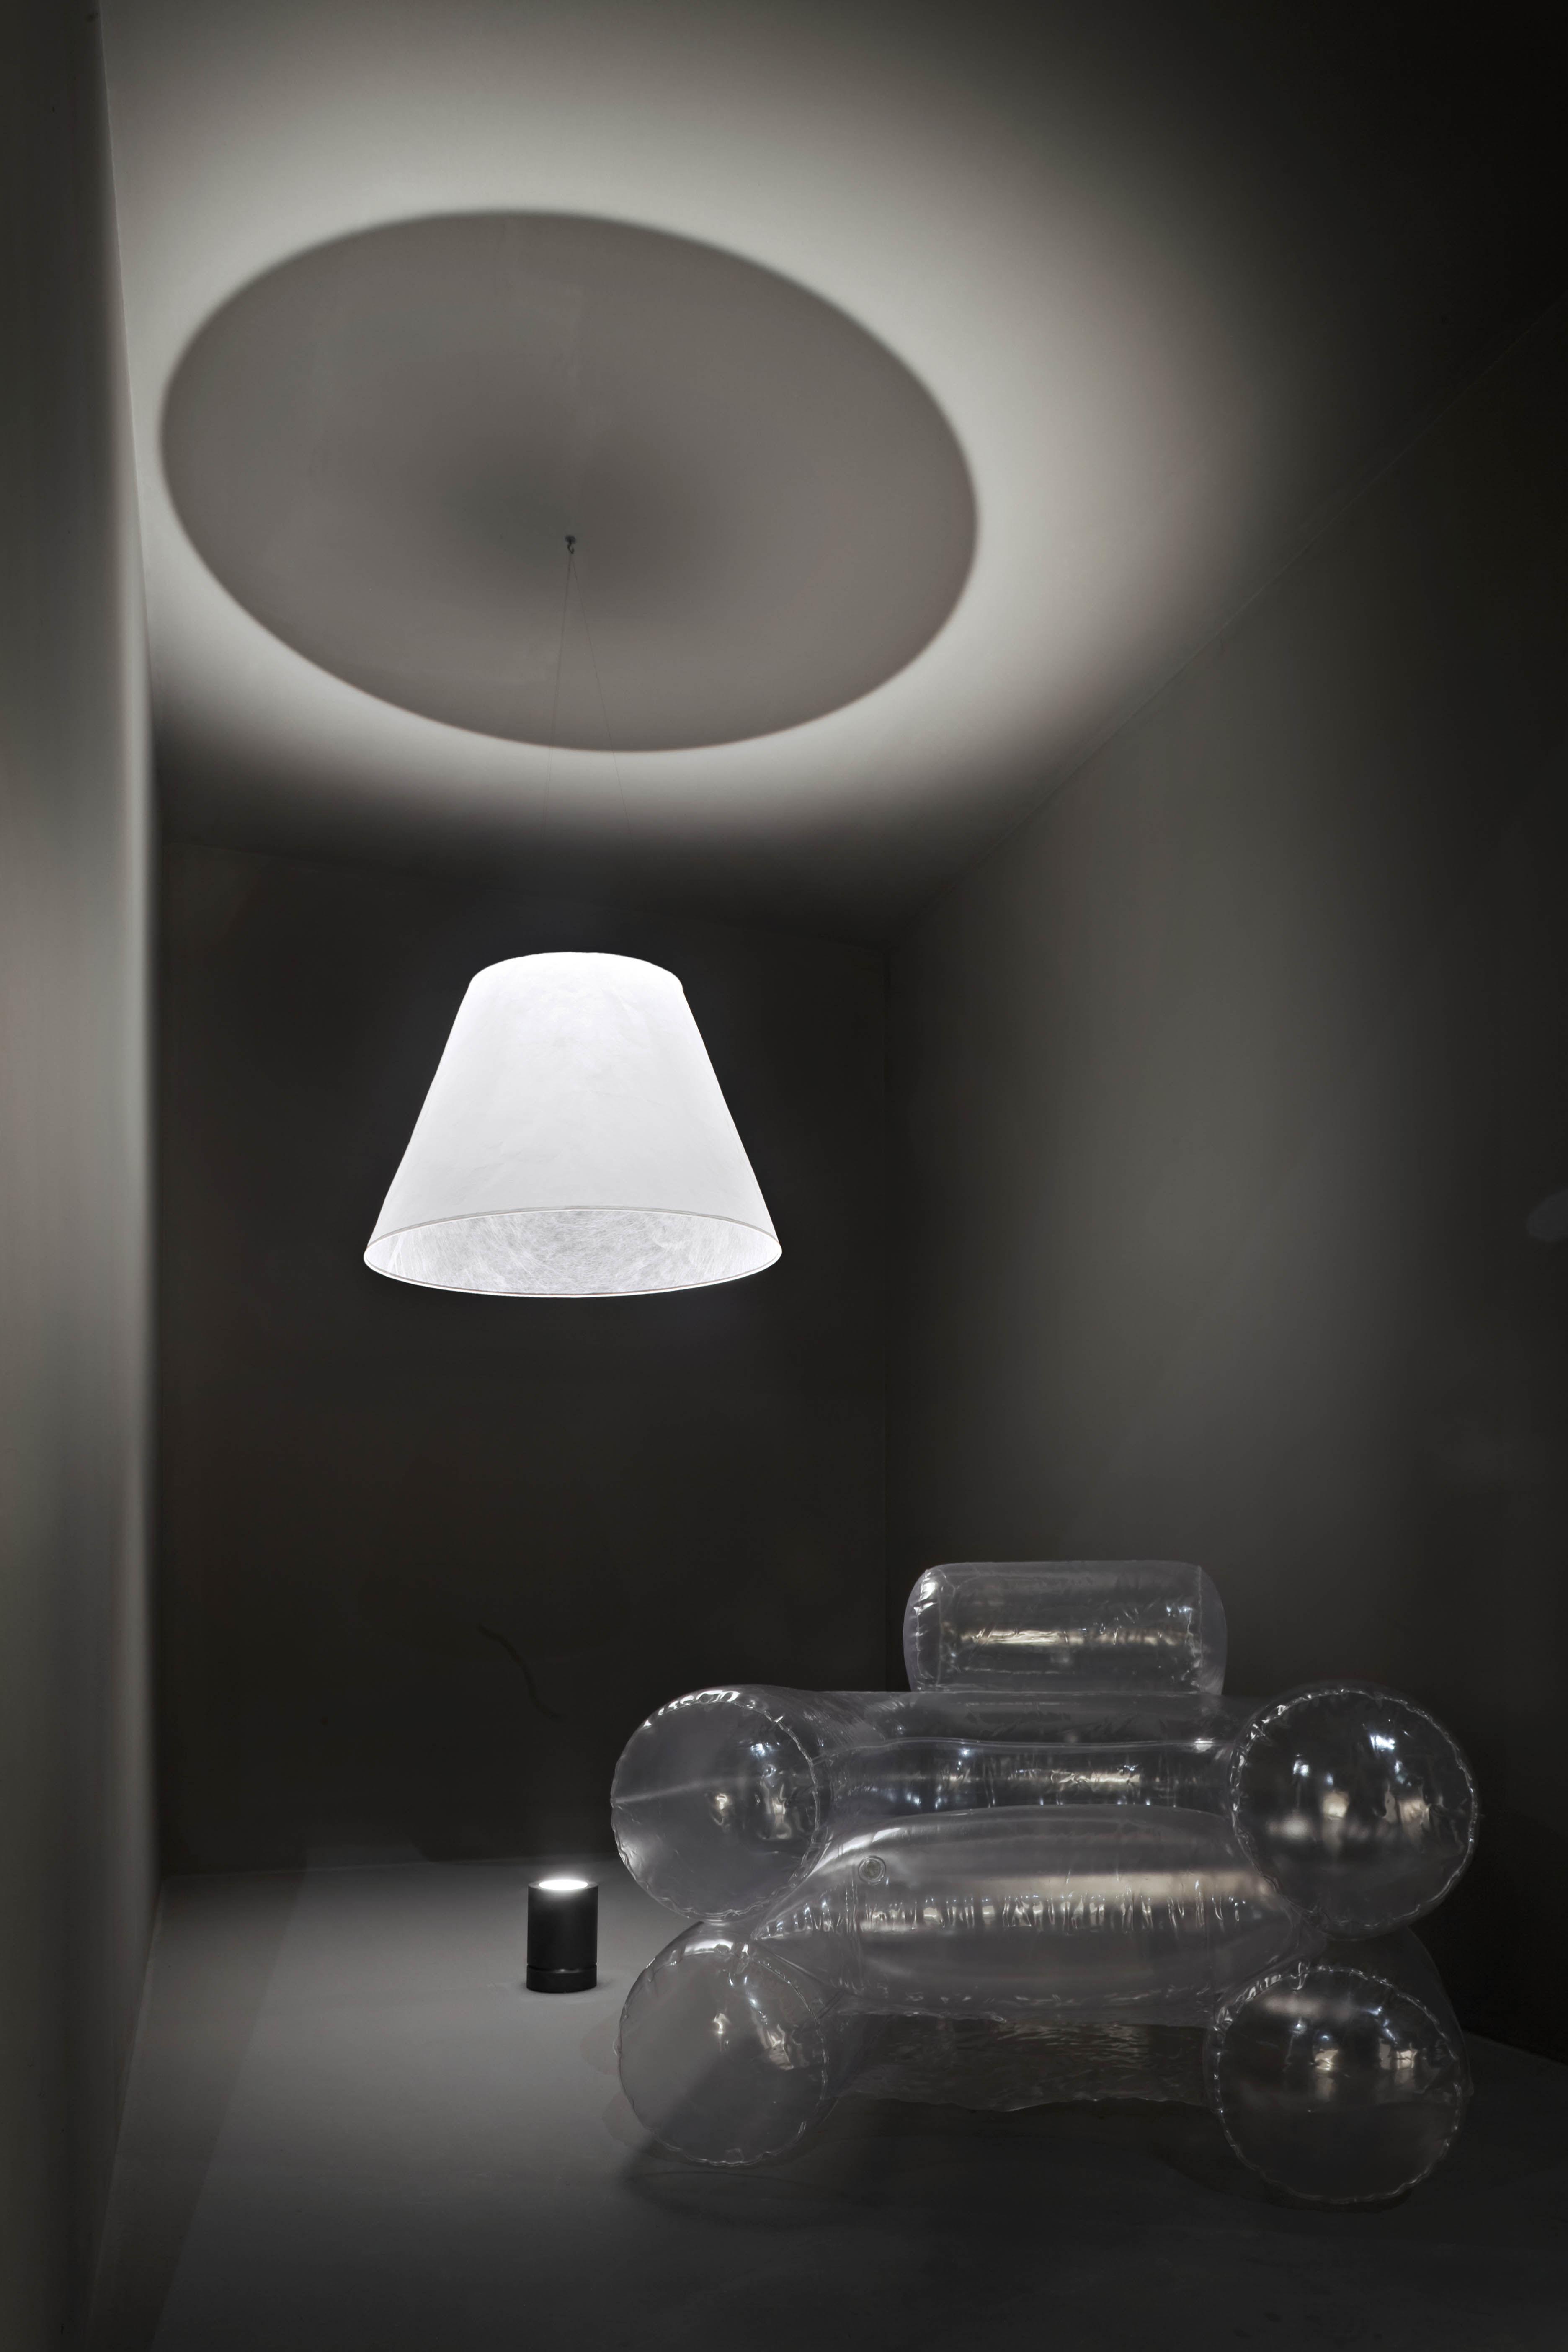 shade lampe set aus led bodenprojektor lampenschirm projektor schwarz lampenschirm wei. Black Bedroom Furniture Sets. Home Design Ideas